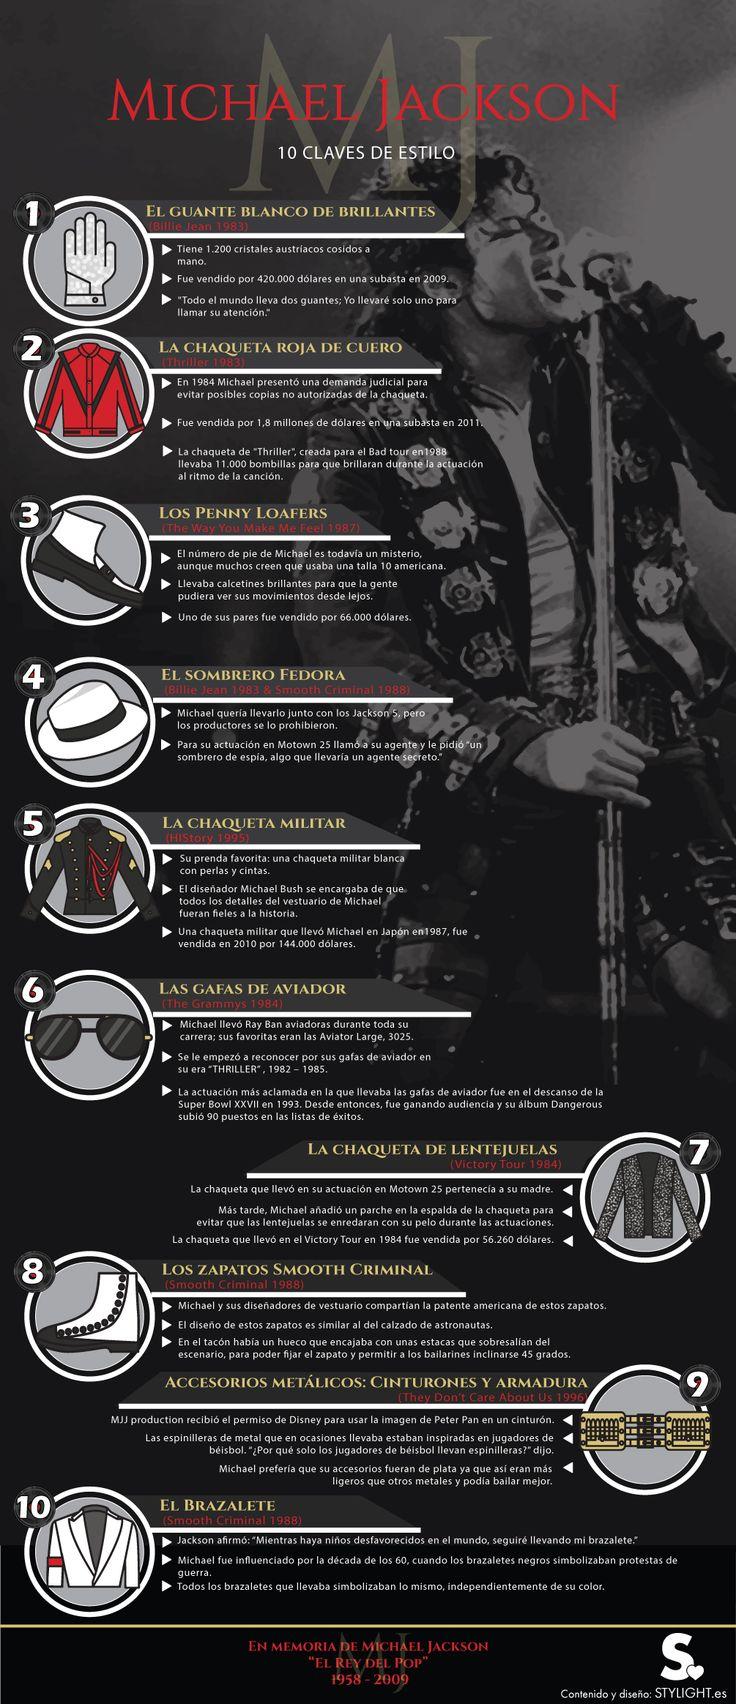 Michael Jackson: 10 claves de estilo